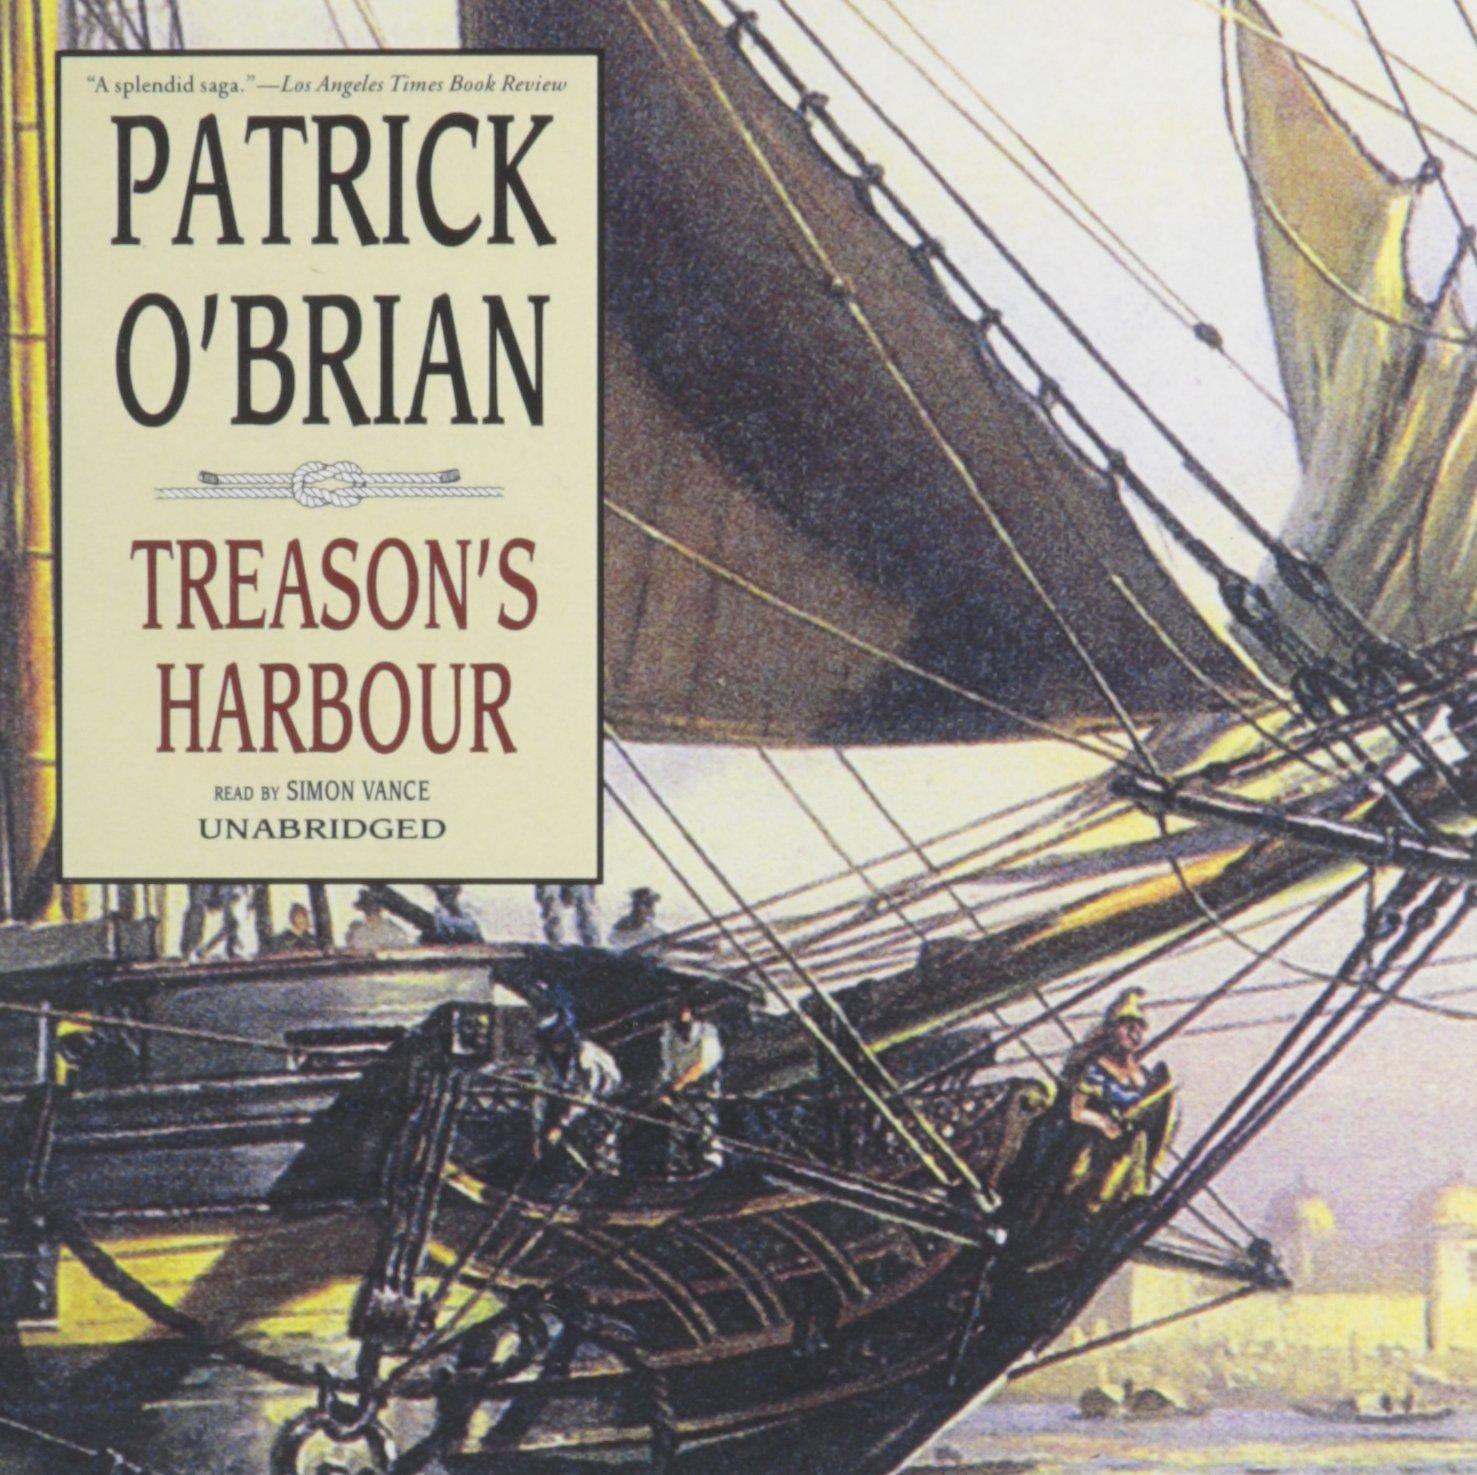 Treason's Harbour (Aubrey-Maturin series, Book 9)(Library Edition) pdf